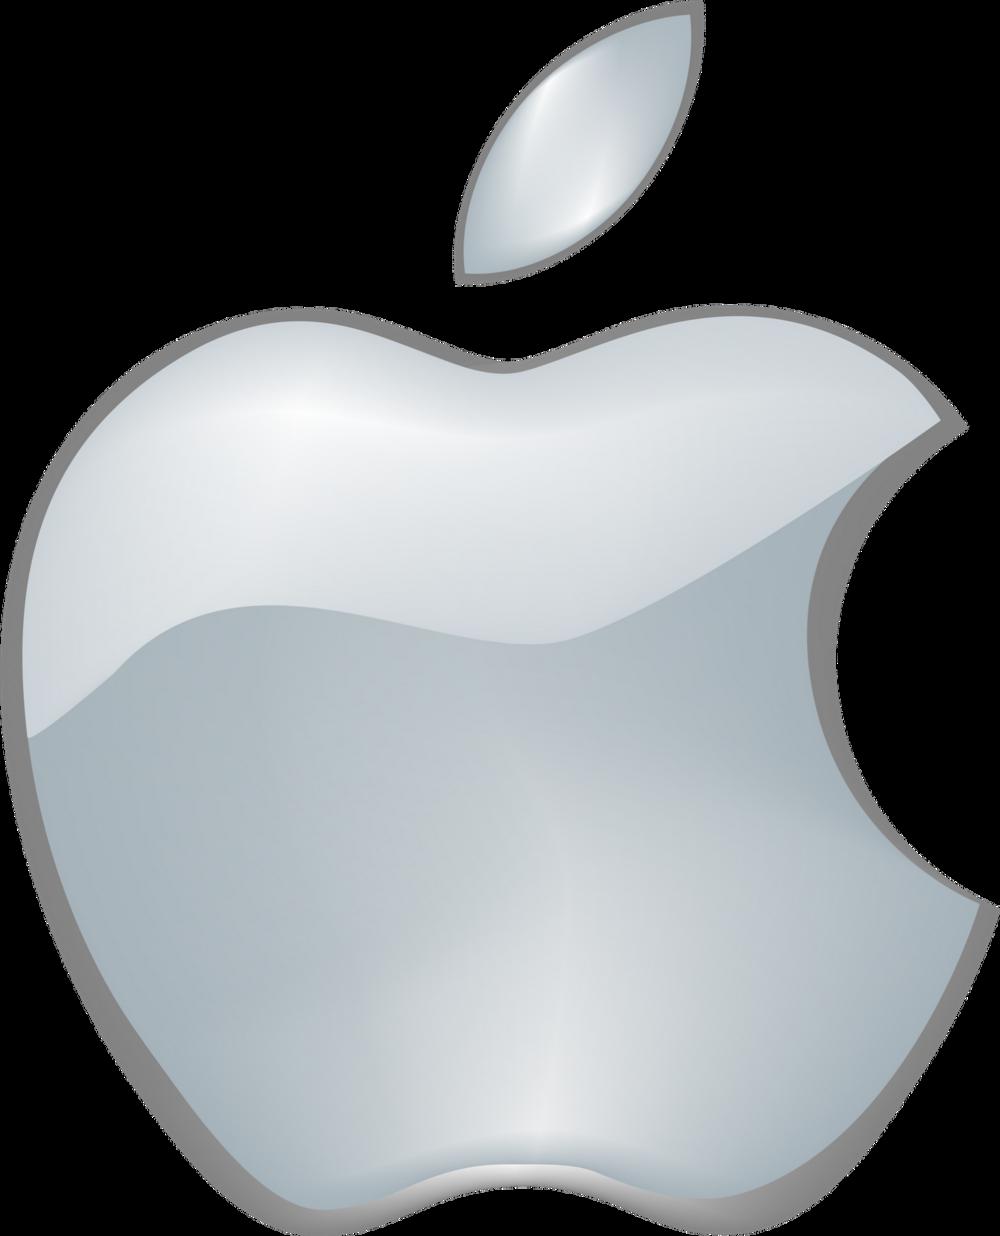 5ae69d370c442e04d268fbd3a147b4aa_-images-for-apple-mail-clipart-hd-apple-logo_1294-1600.png